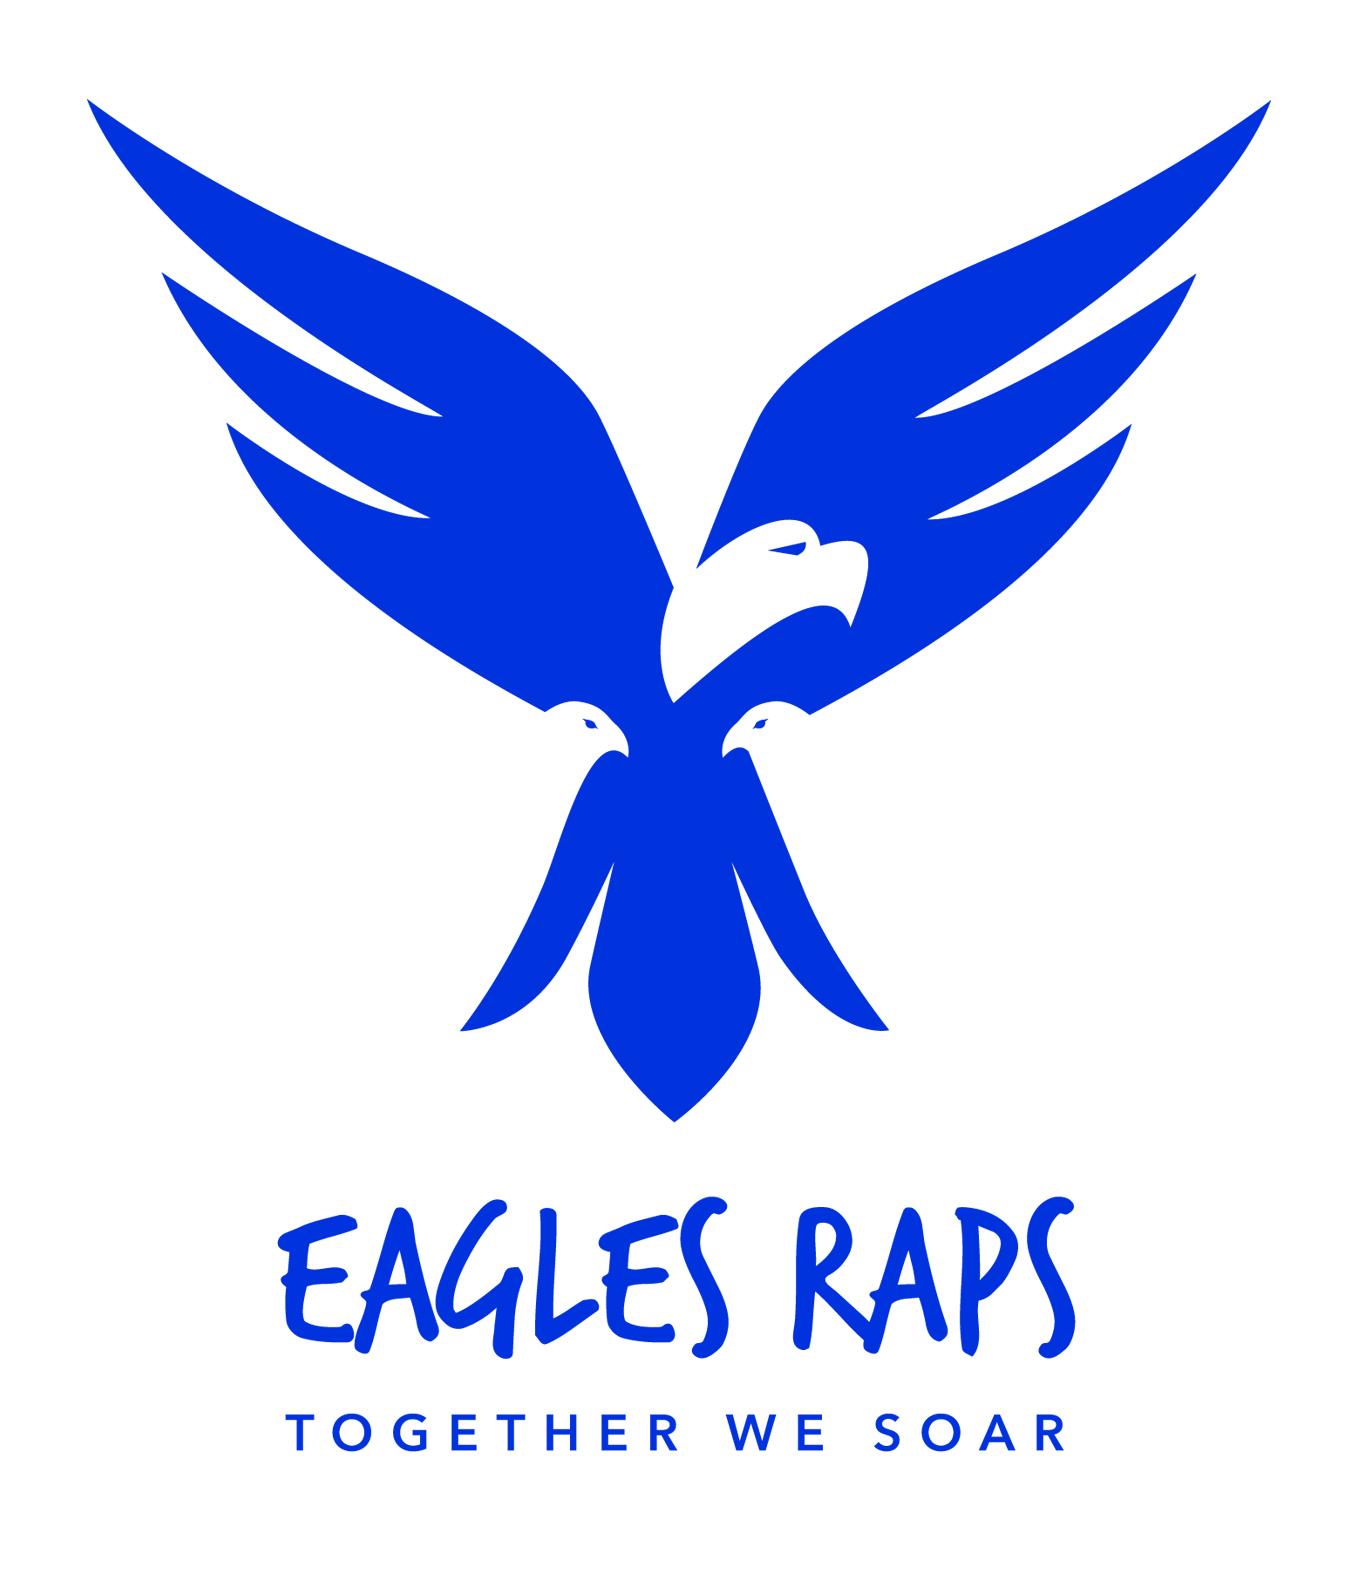 Eagles RAPS logo.jpg